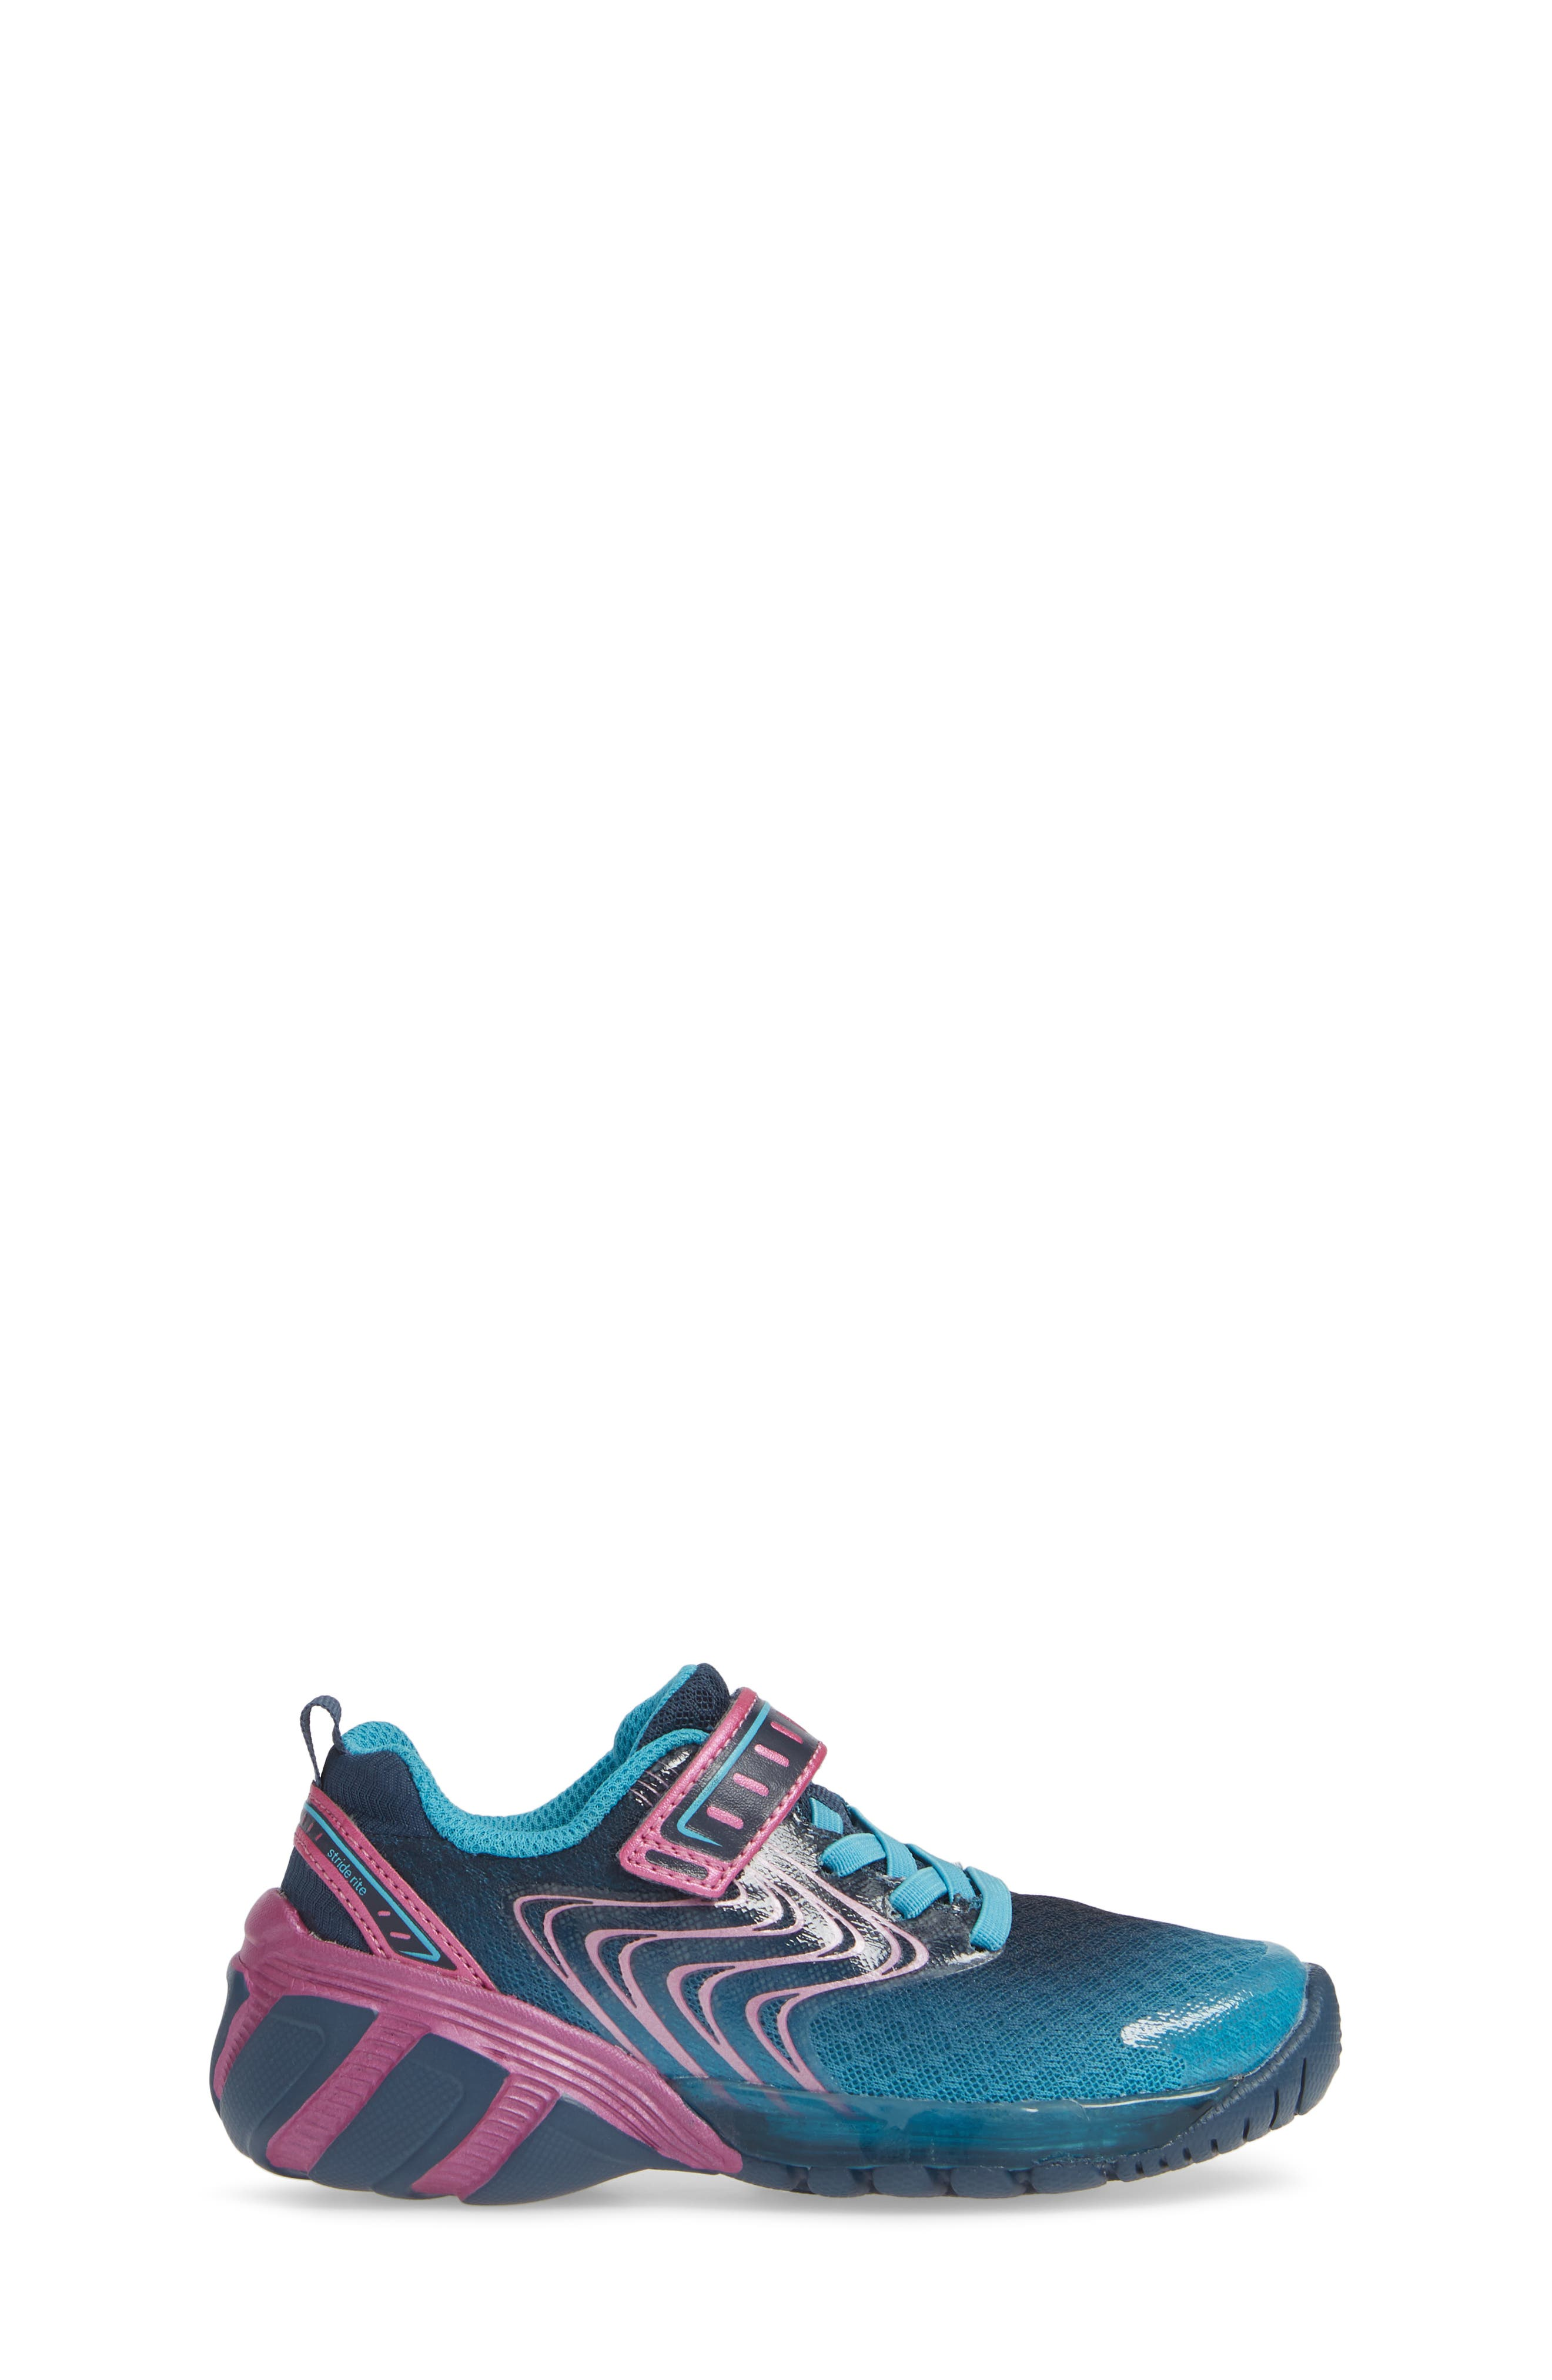 Lights Lux Light-Up Sneaker,                             Alternate thumbnail 3, color,                             400